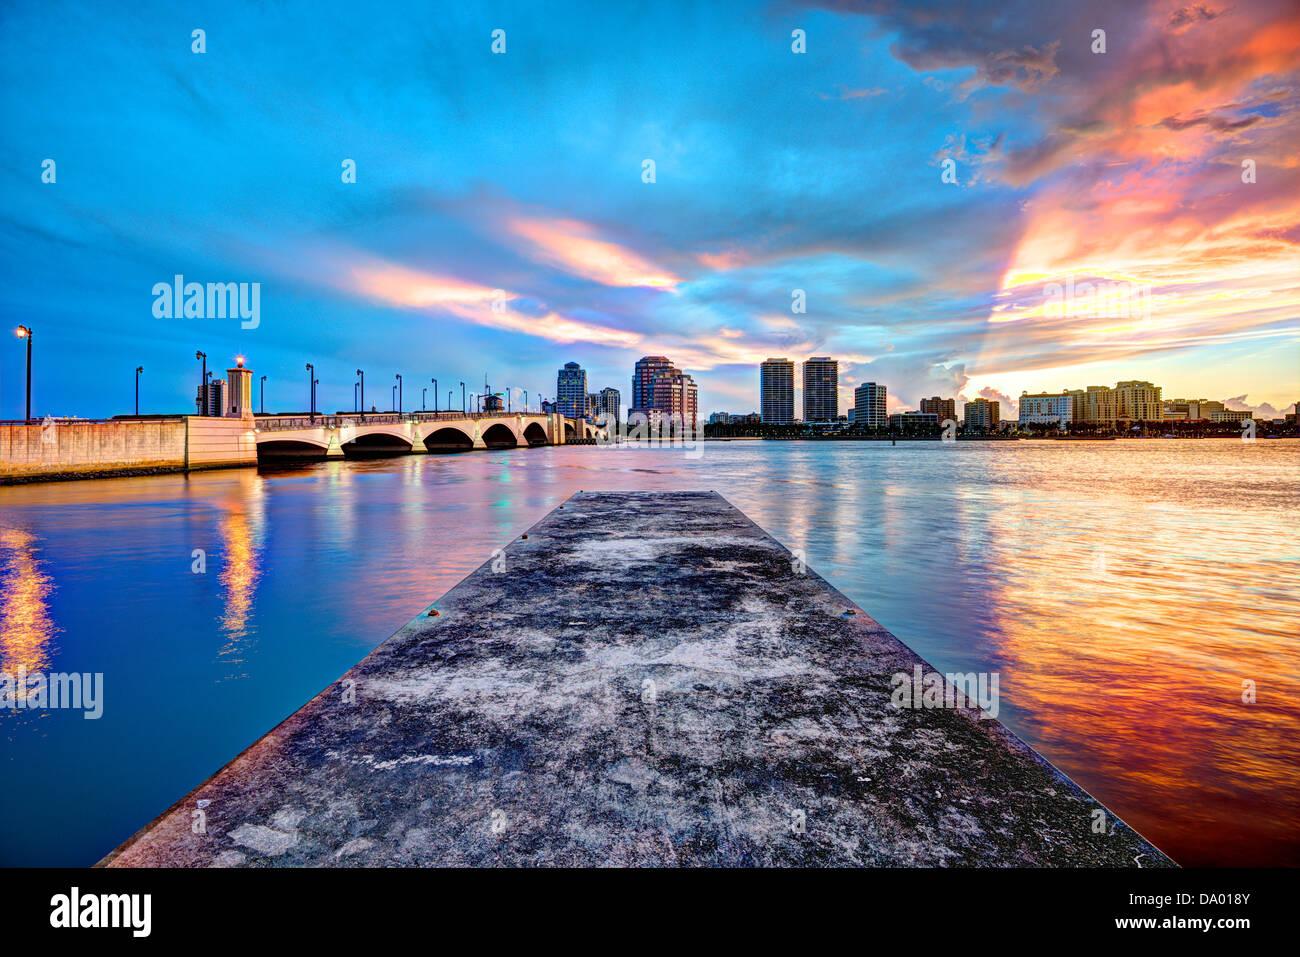 Downtown West Palm Beach, Florida skyline. - Stock Image